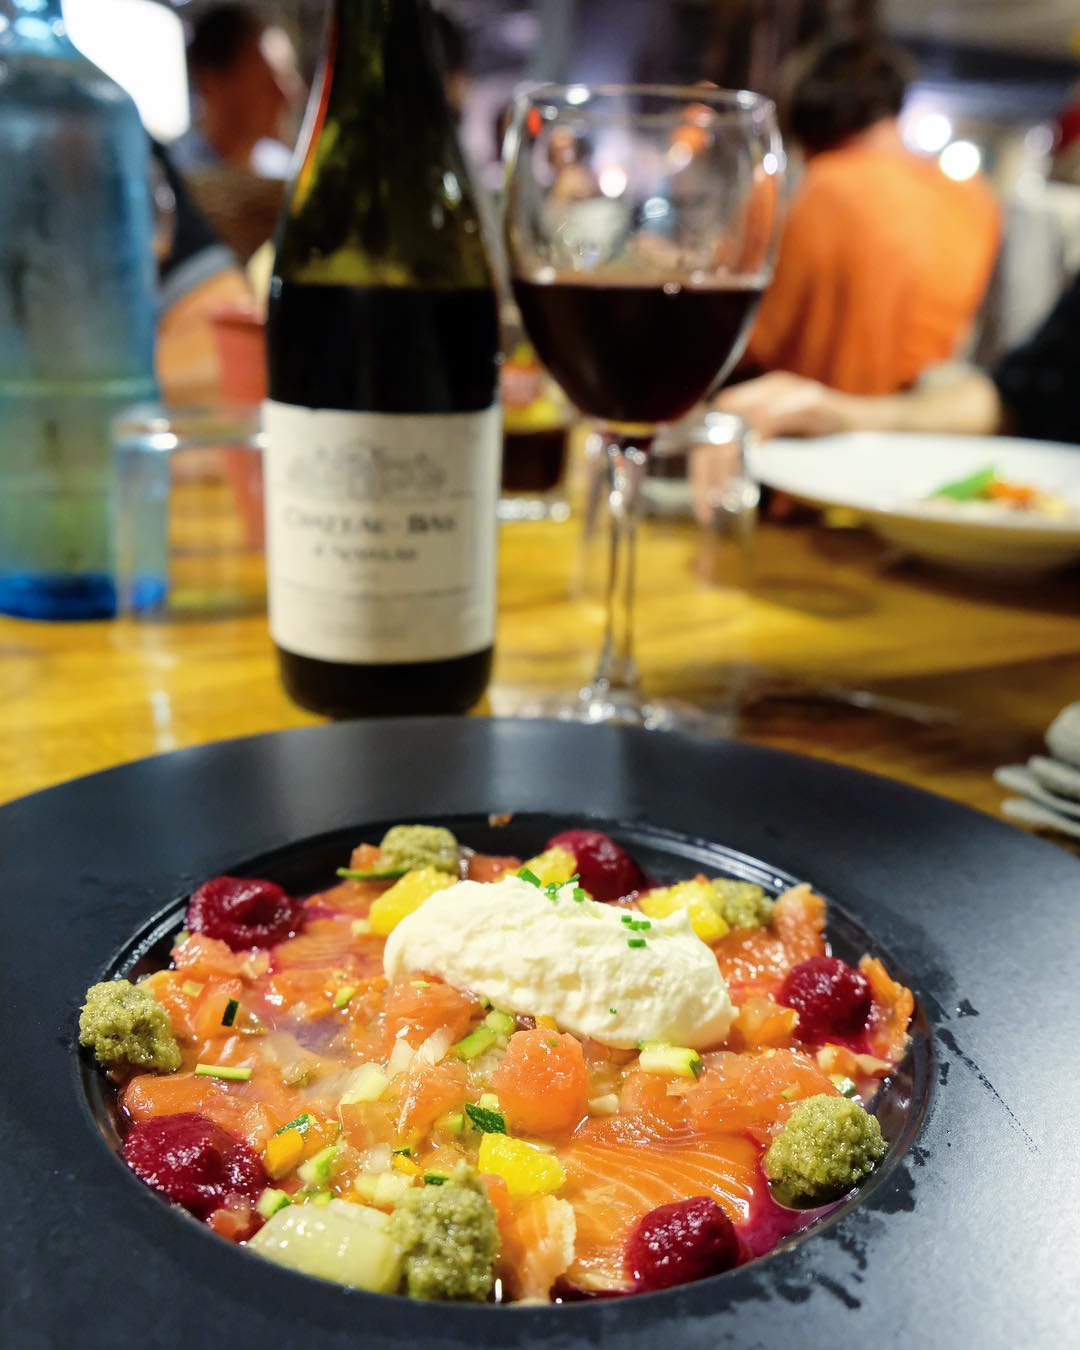 〰 S A U M O N ?? 〰 . . ➕ LE J • restaurant de Plage à l'année . ? Carnon (34)?? ??? Bientôt Article sur le blog  _______________ #lejcarnon #restaurant #food #foodlover #blogfood #foodporn #foodstagram #gastronomy #cooking #foodphotography #montpellier #carnon #pintademontpellier #seiche #beachlife